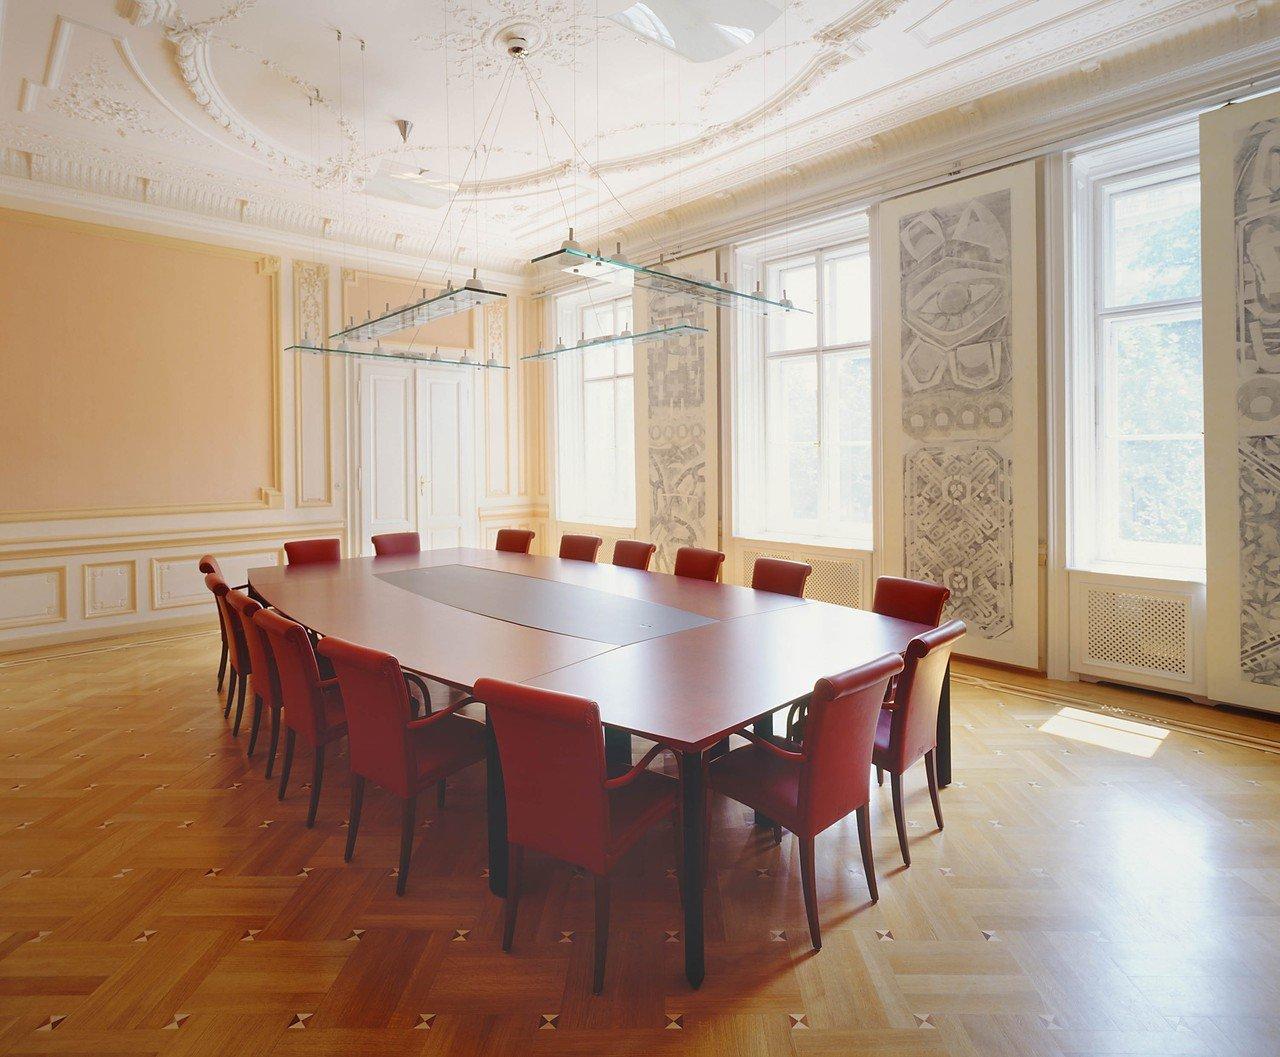 Vienna seminar rooms Salle de réunion Conference Center Schubertring  image 0